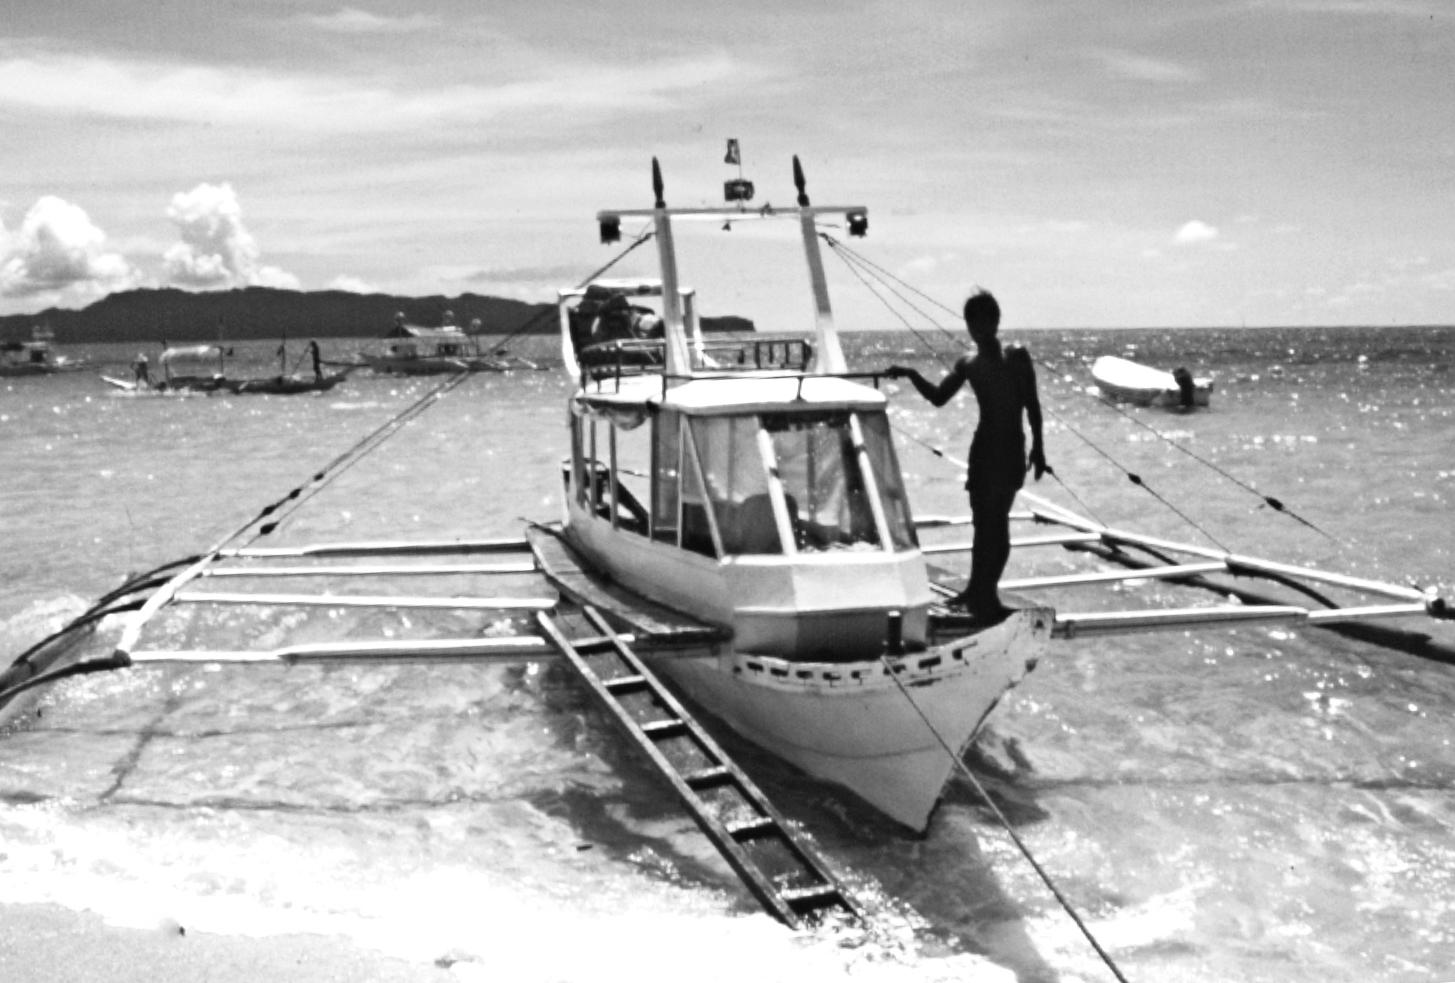 Banka, transporte marítimo entre islas